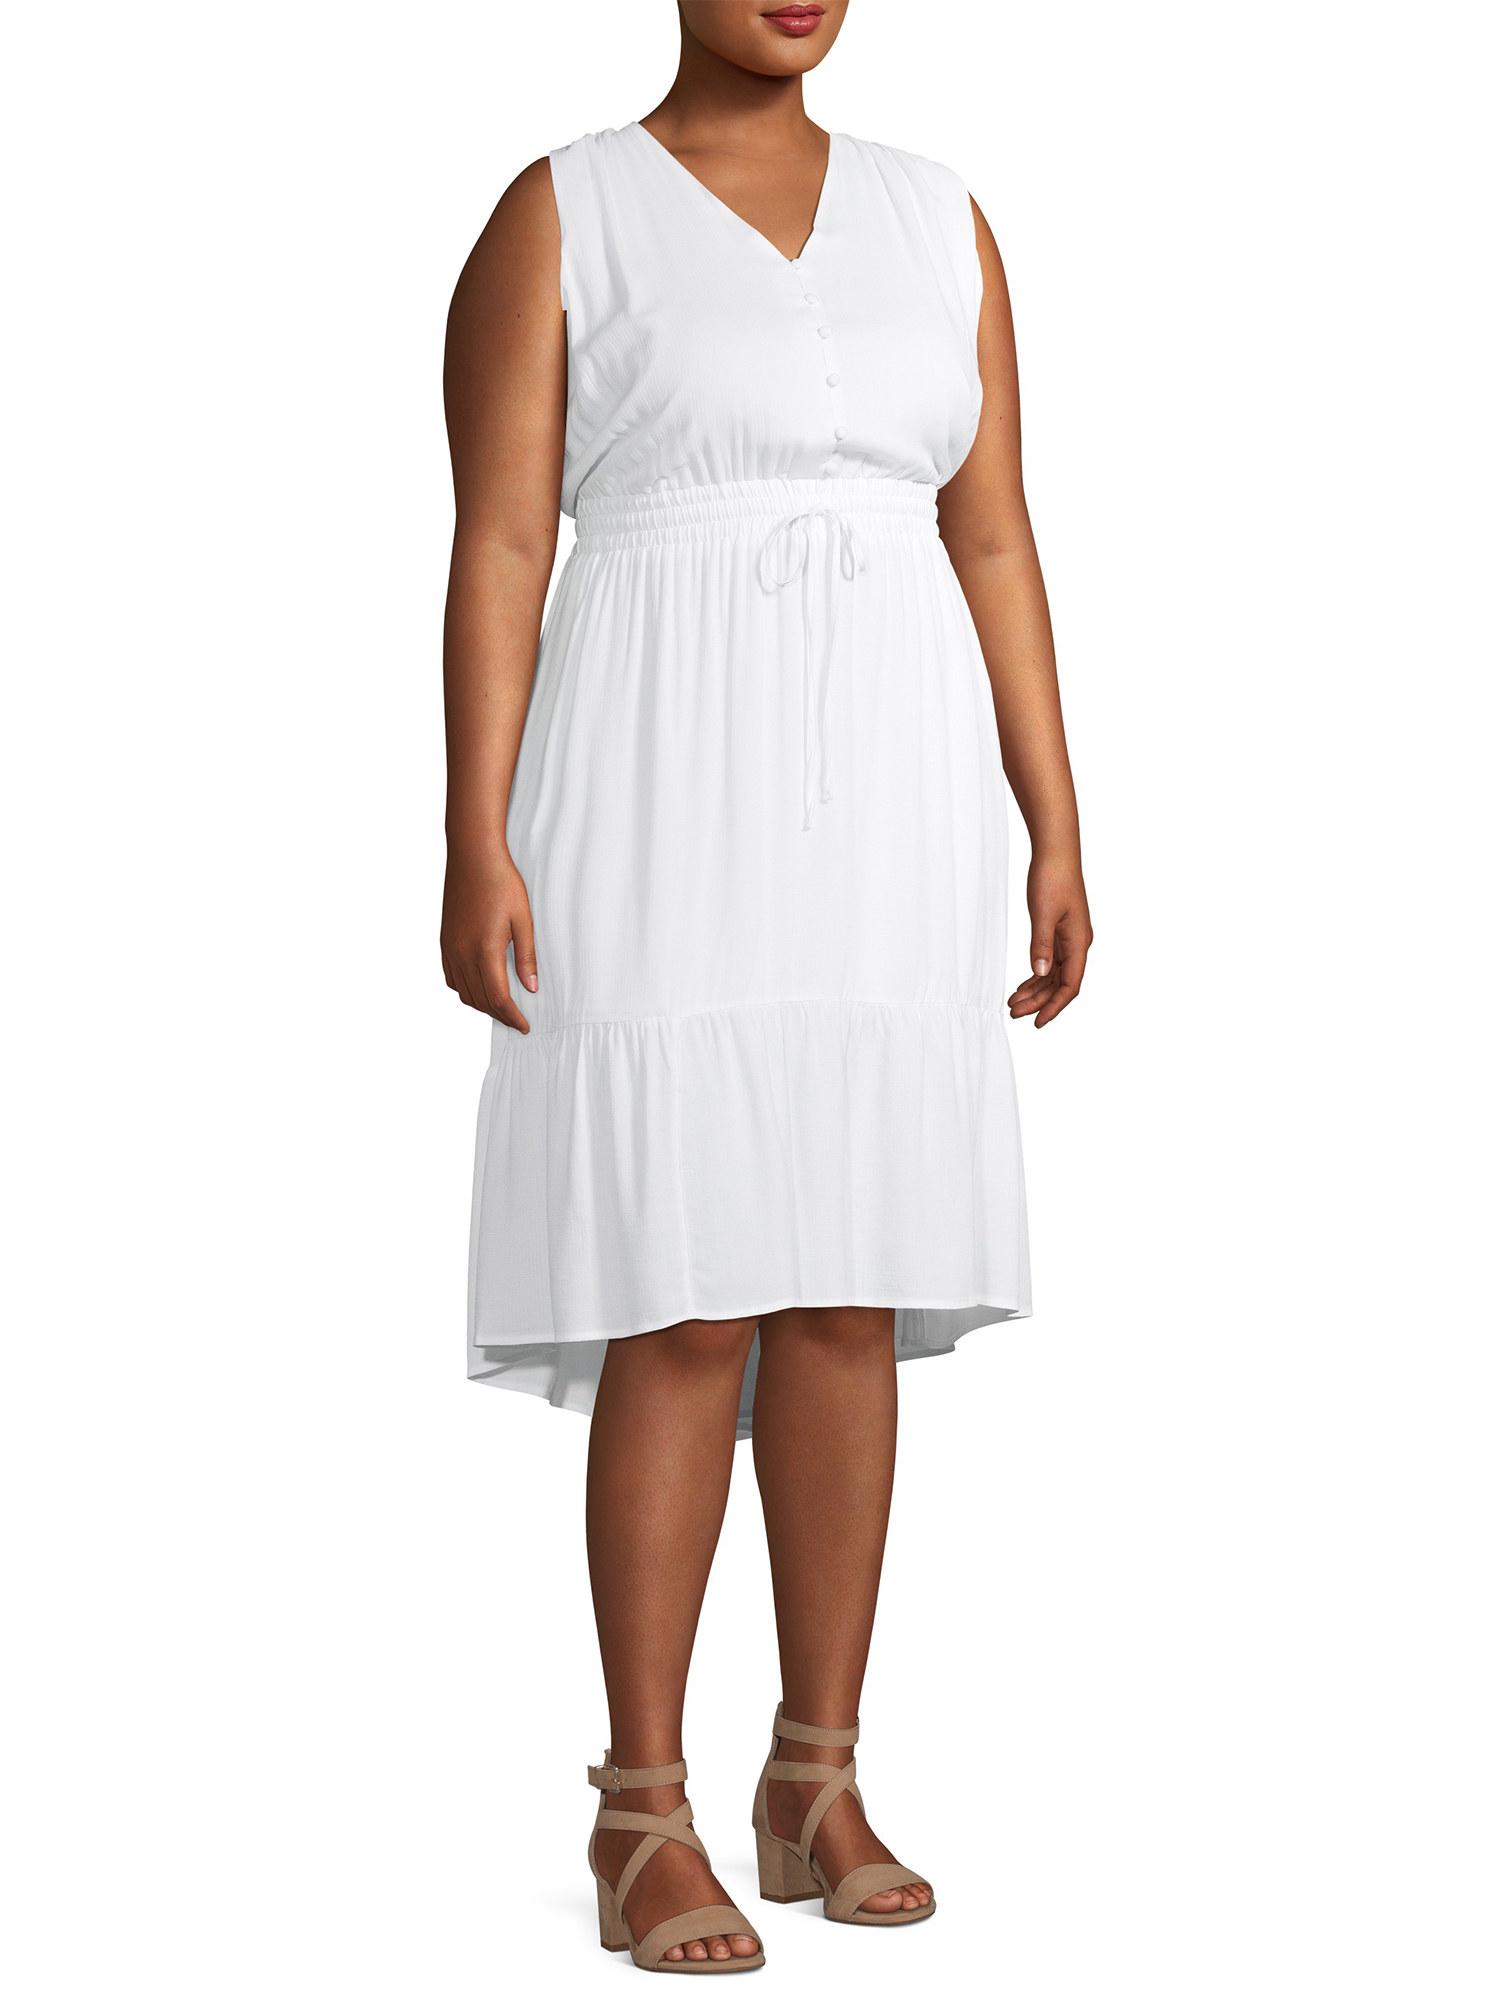 model in a tie-front waist white dress